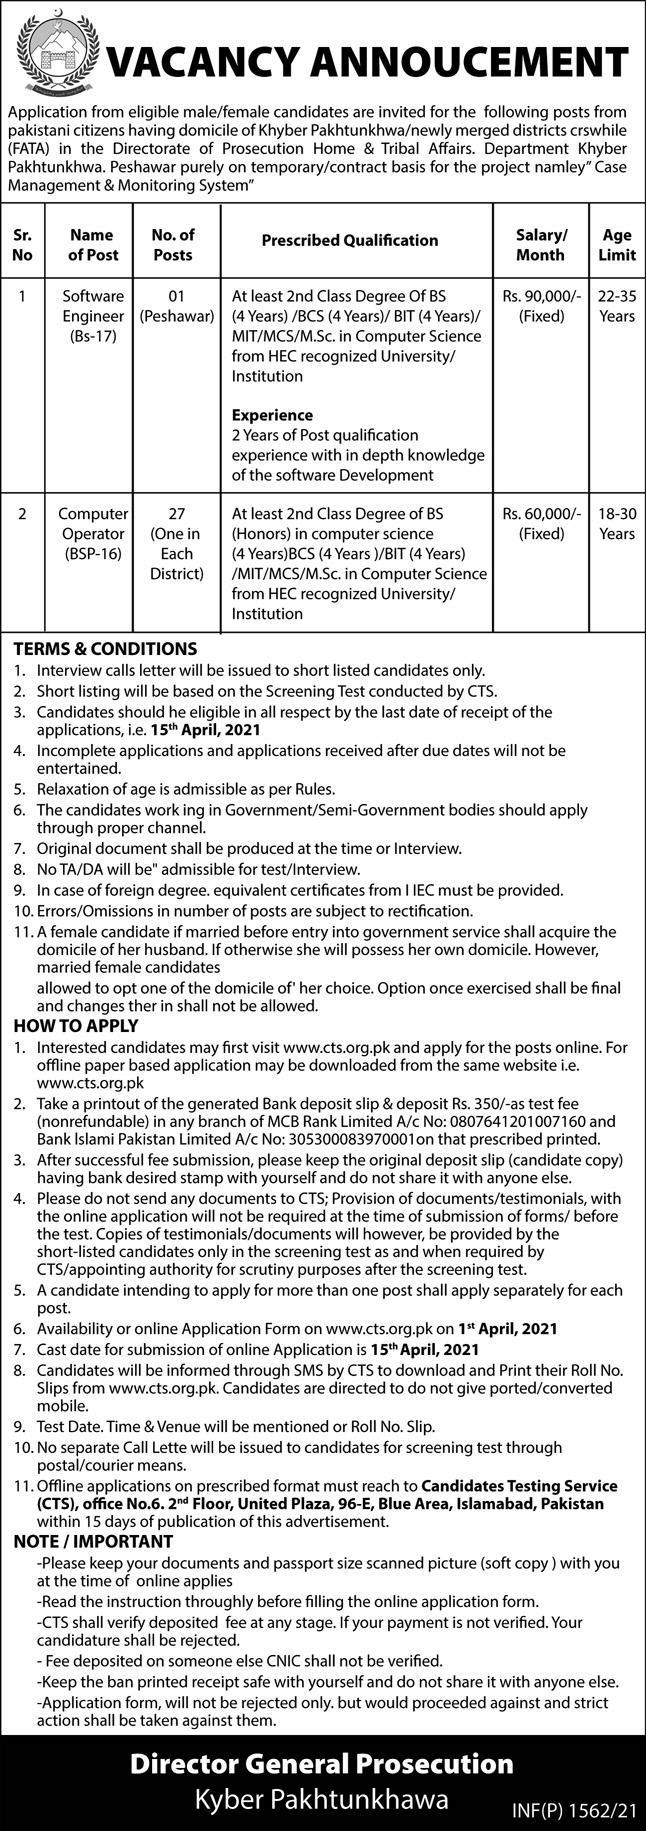 Home & Tribal Affairs Department Jobs 2021 in Peshawar KPK via CTS